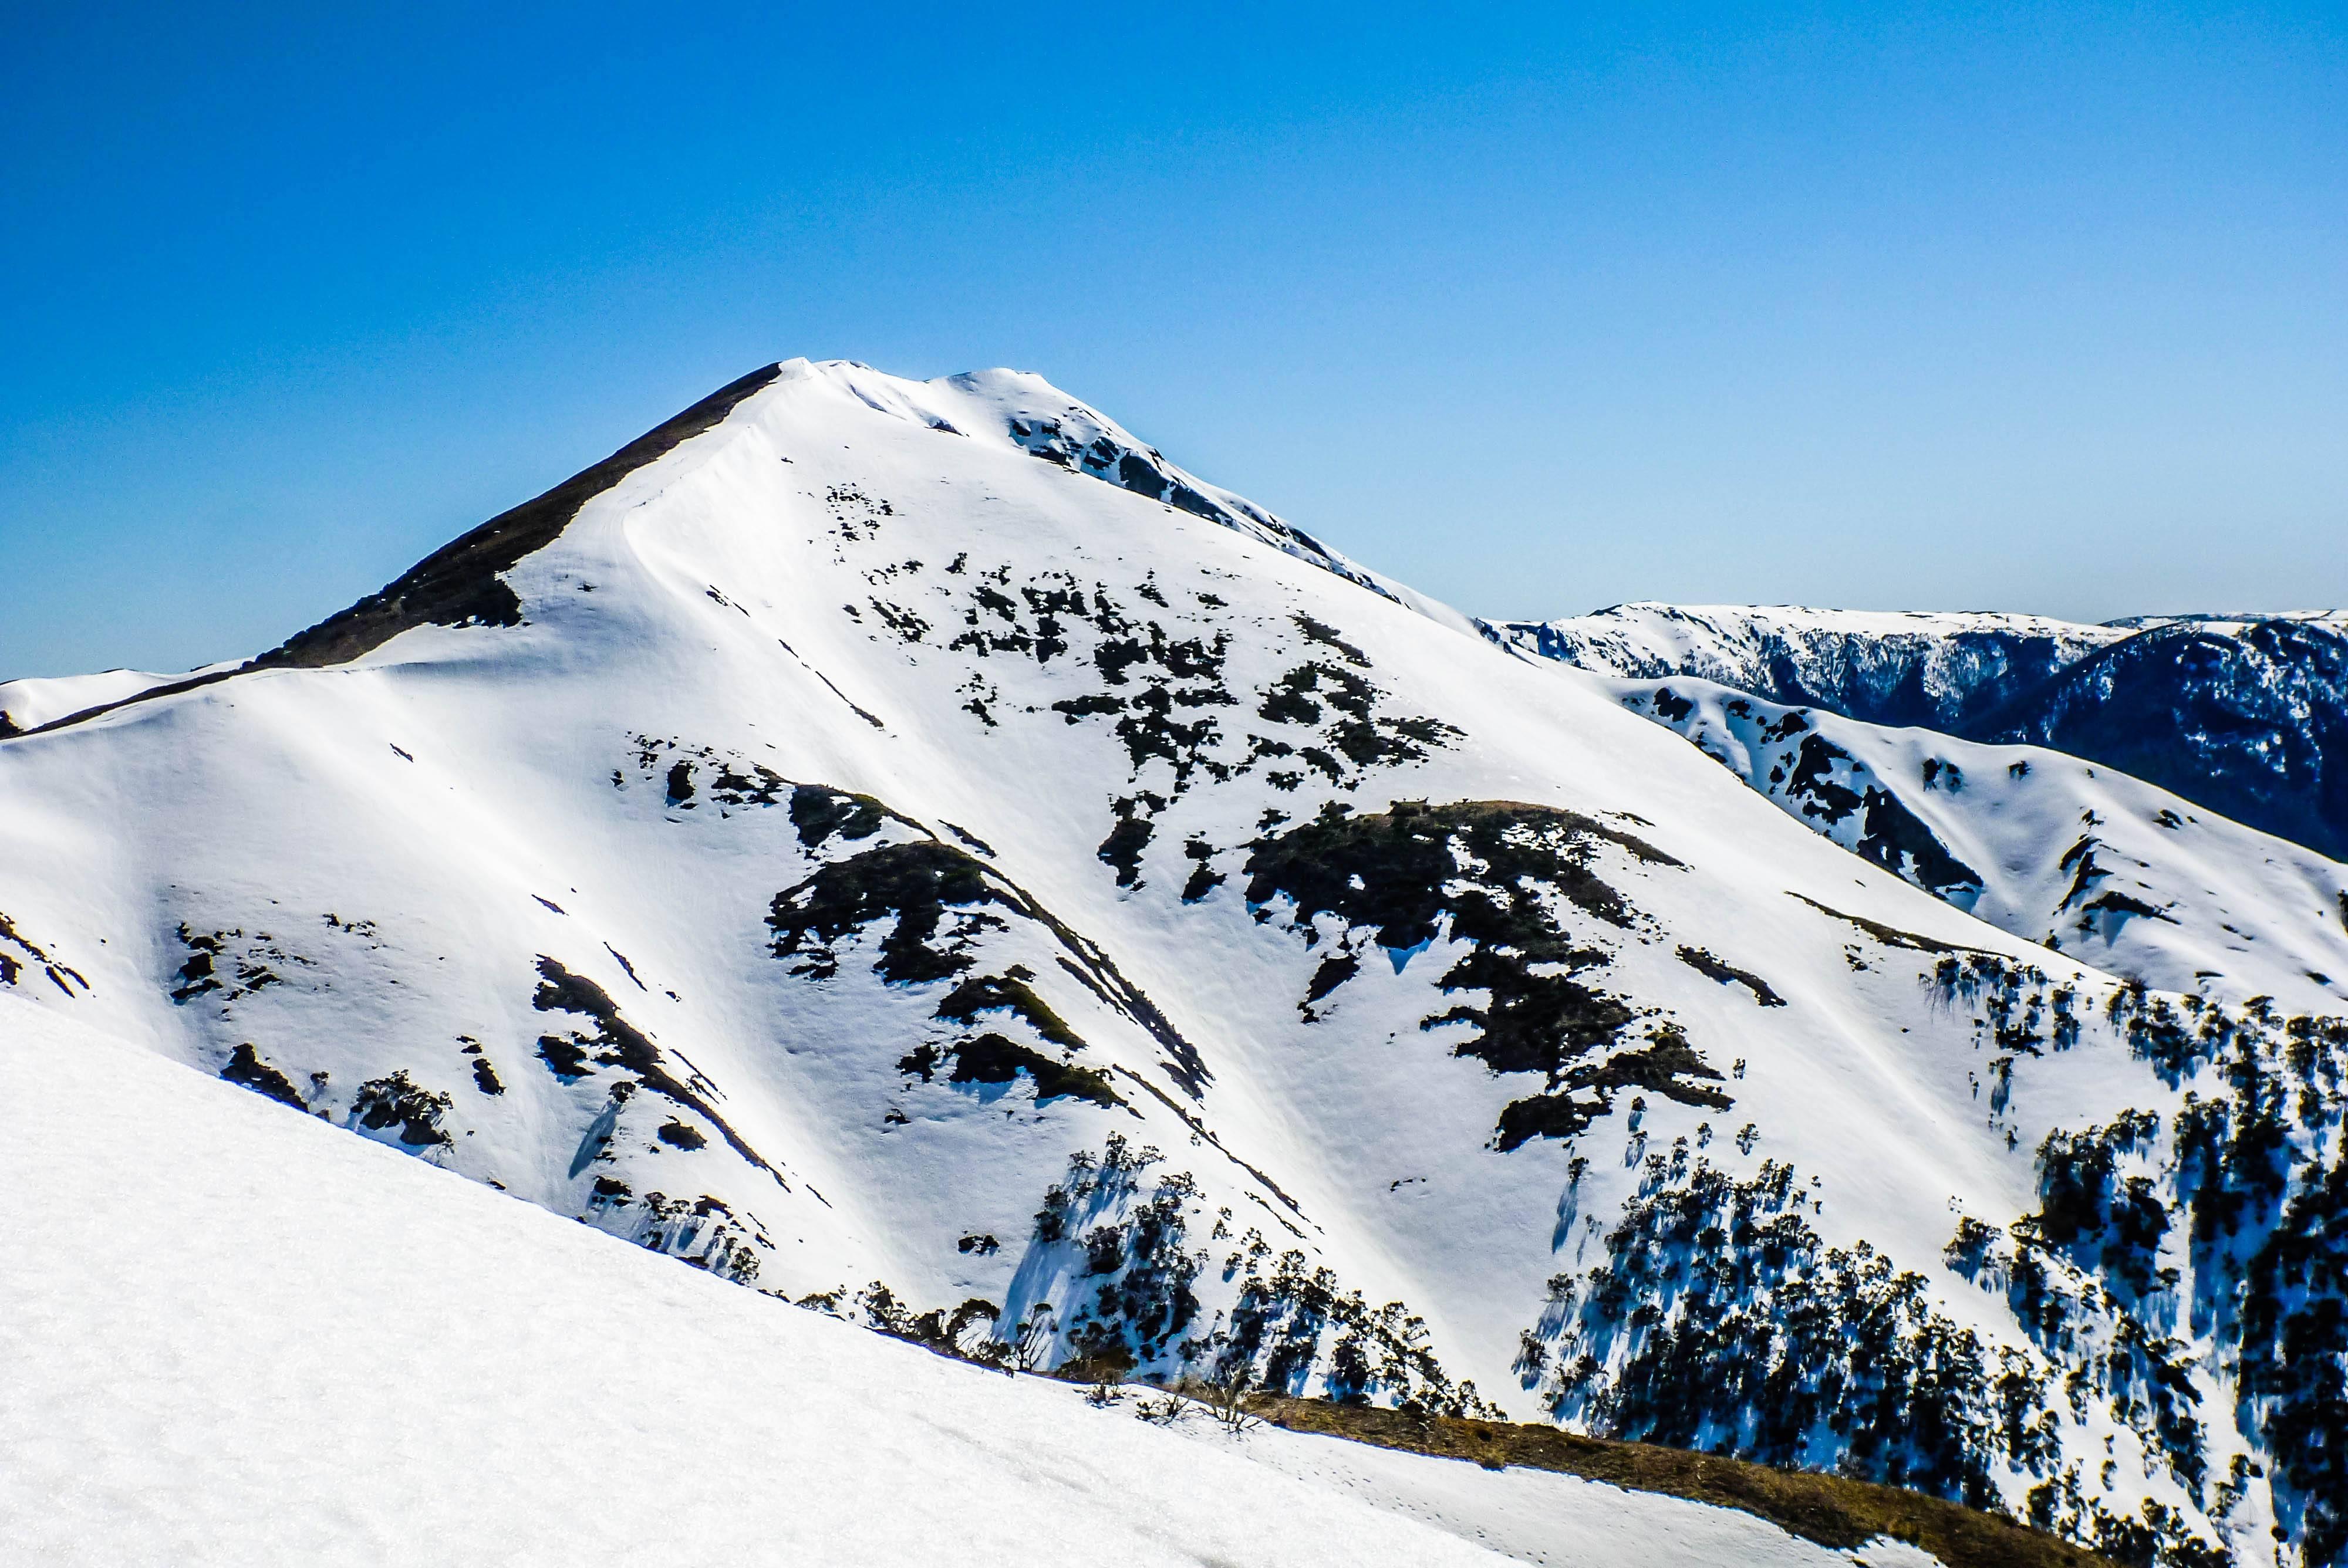 Vic Alps 2017-10-10 019.jpg